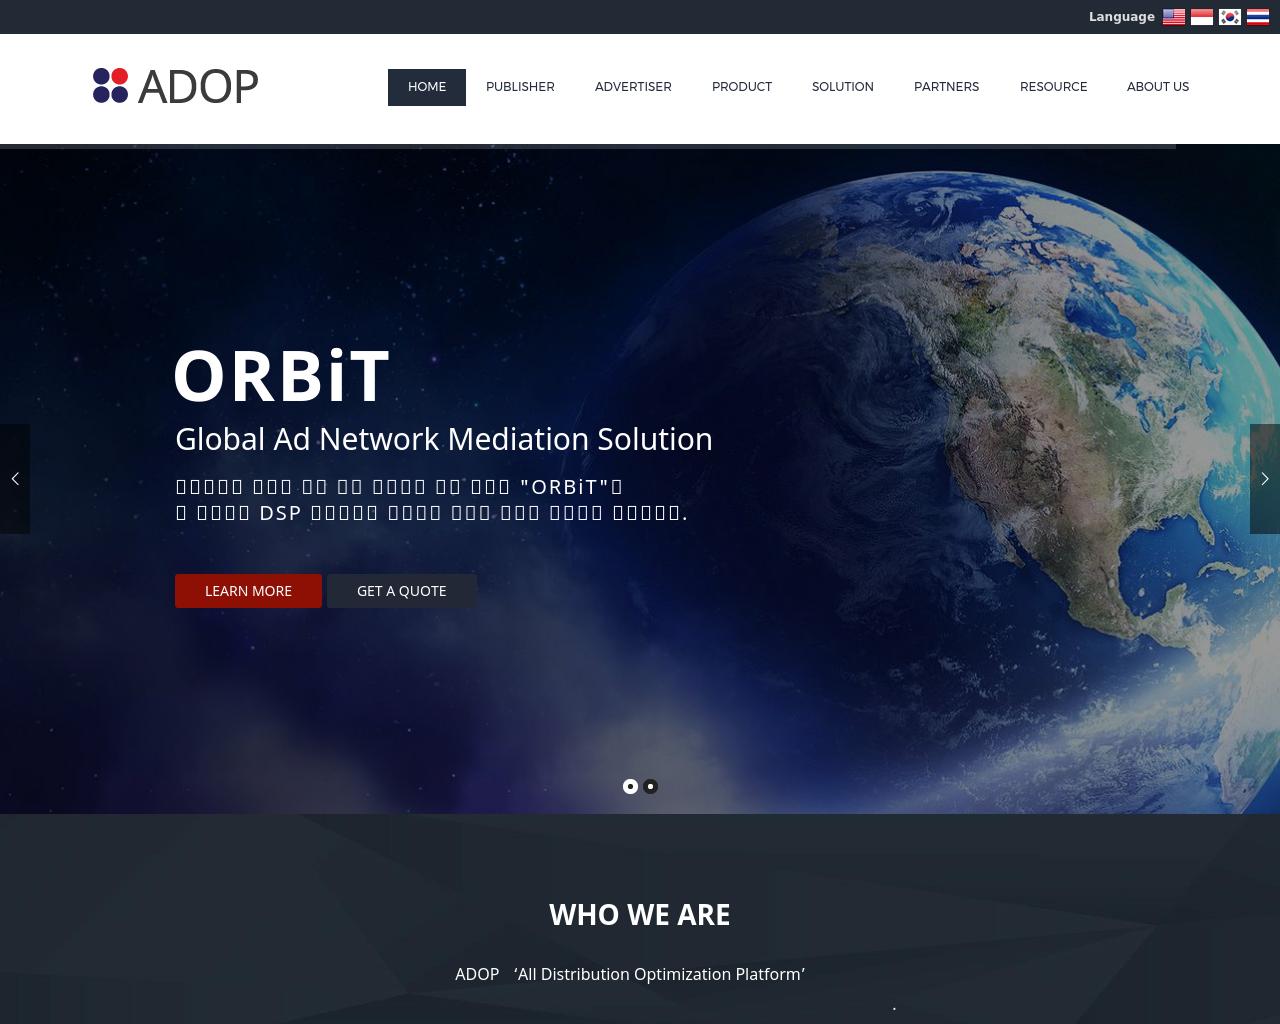 ADOP-Advertising-Reviews-Pricing